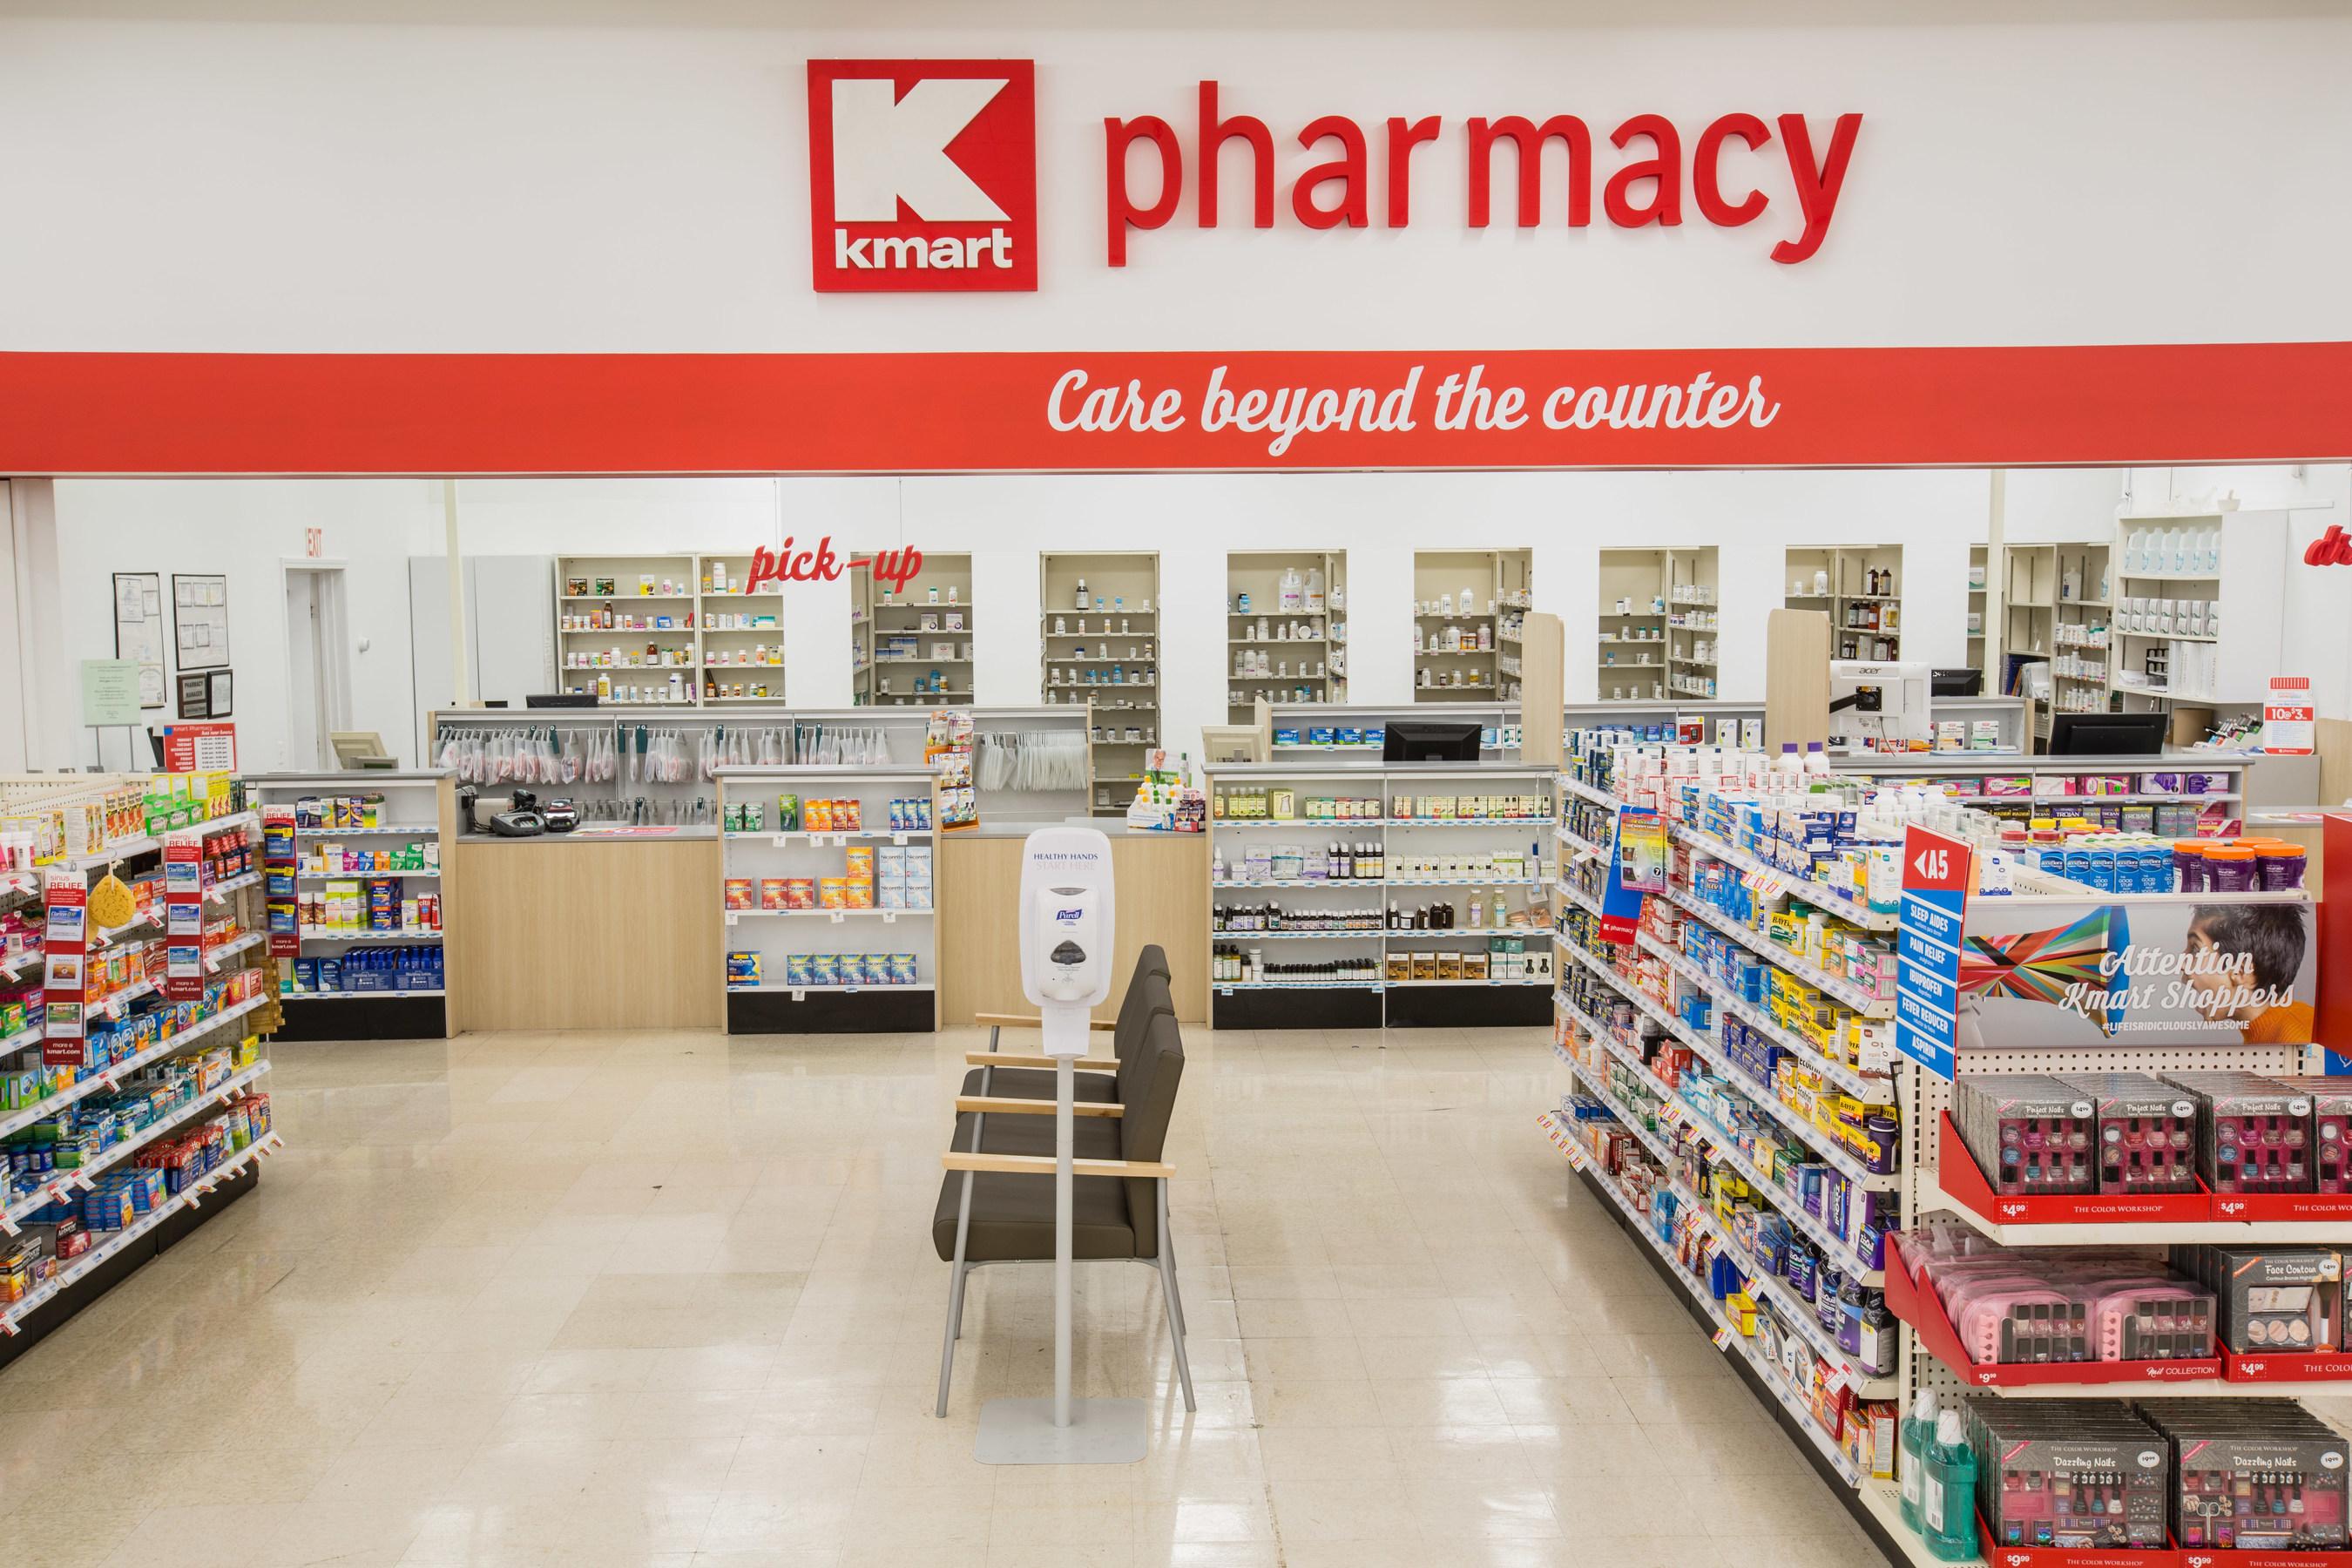 Kmart Pharmacy Announces Copays as Low as $1* with Medicare Part D.